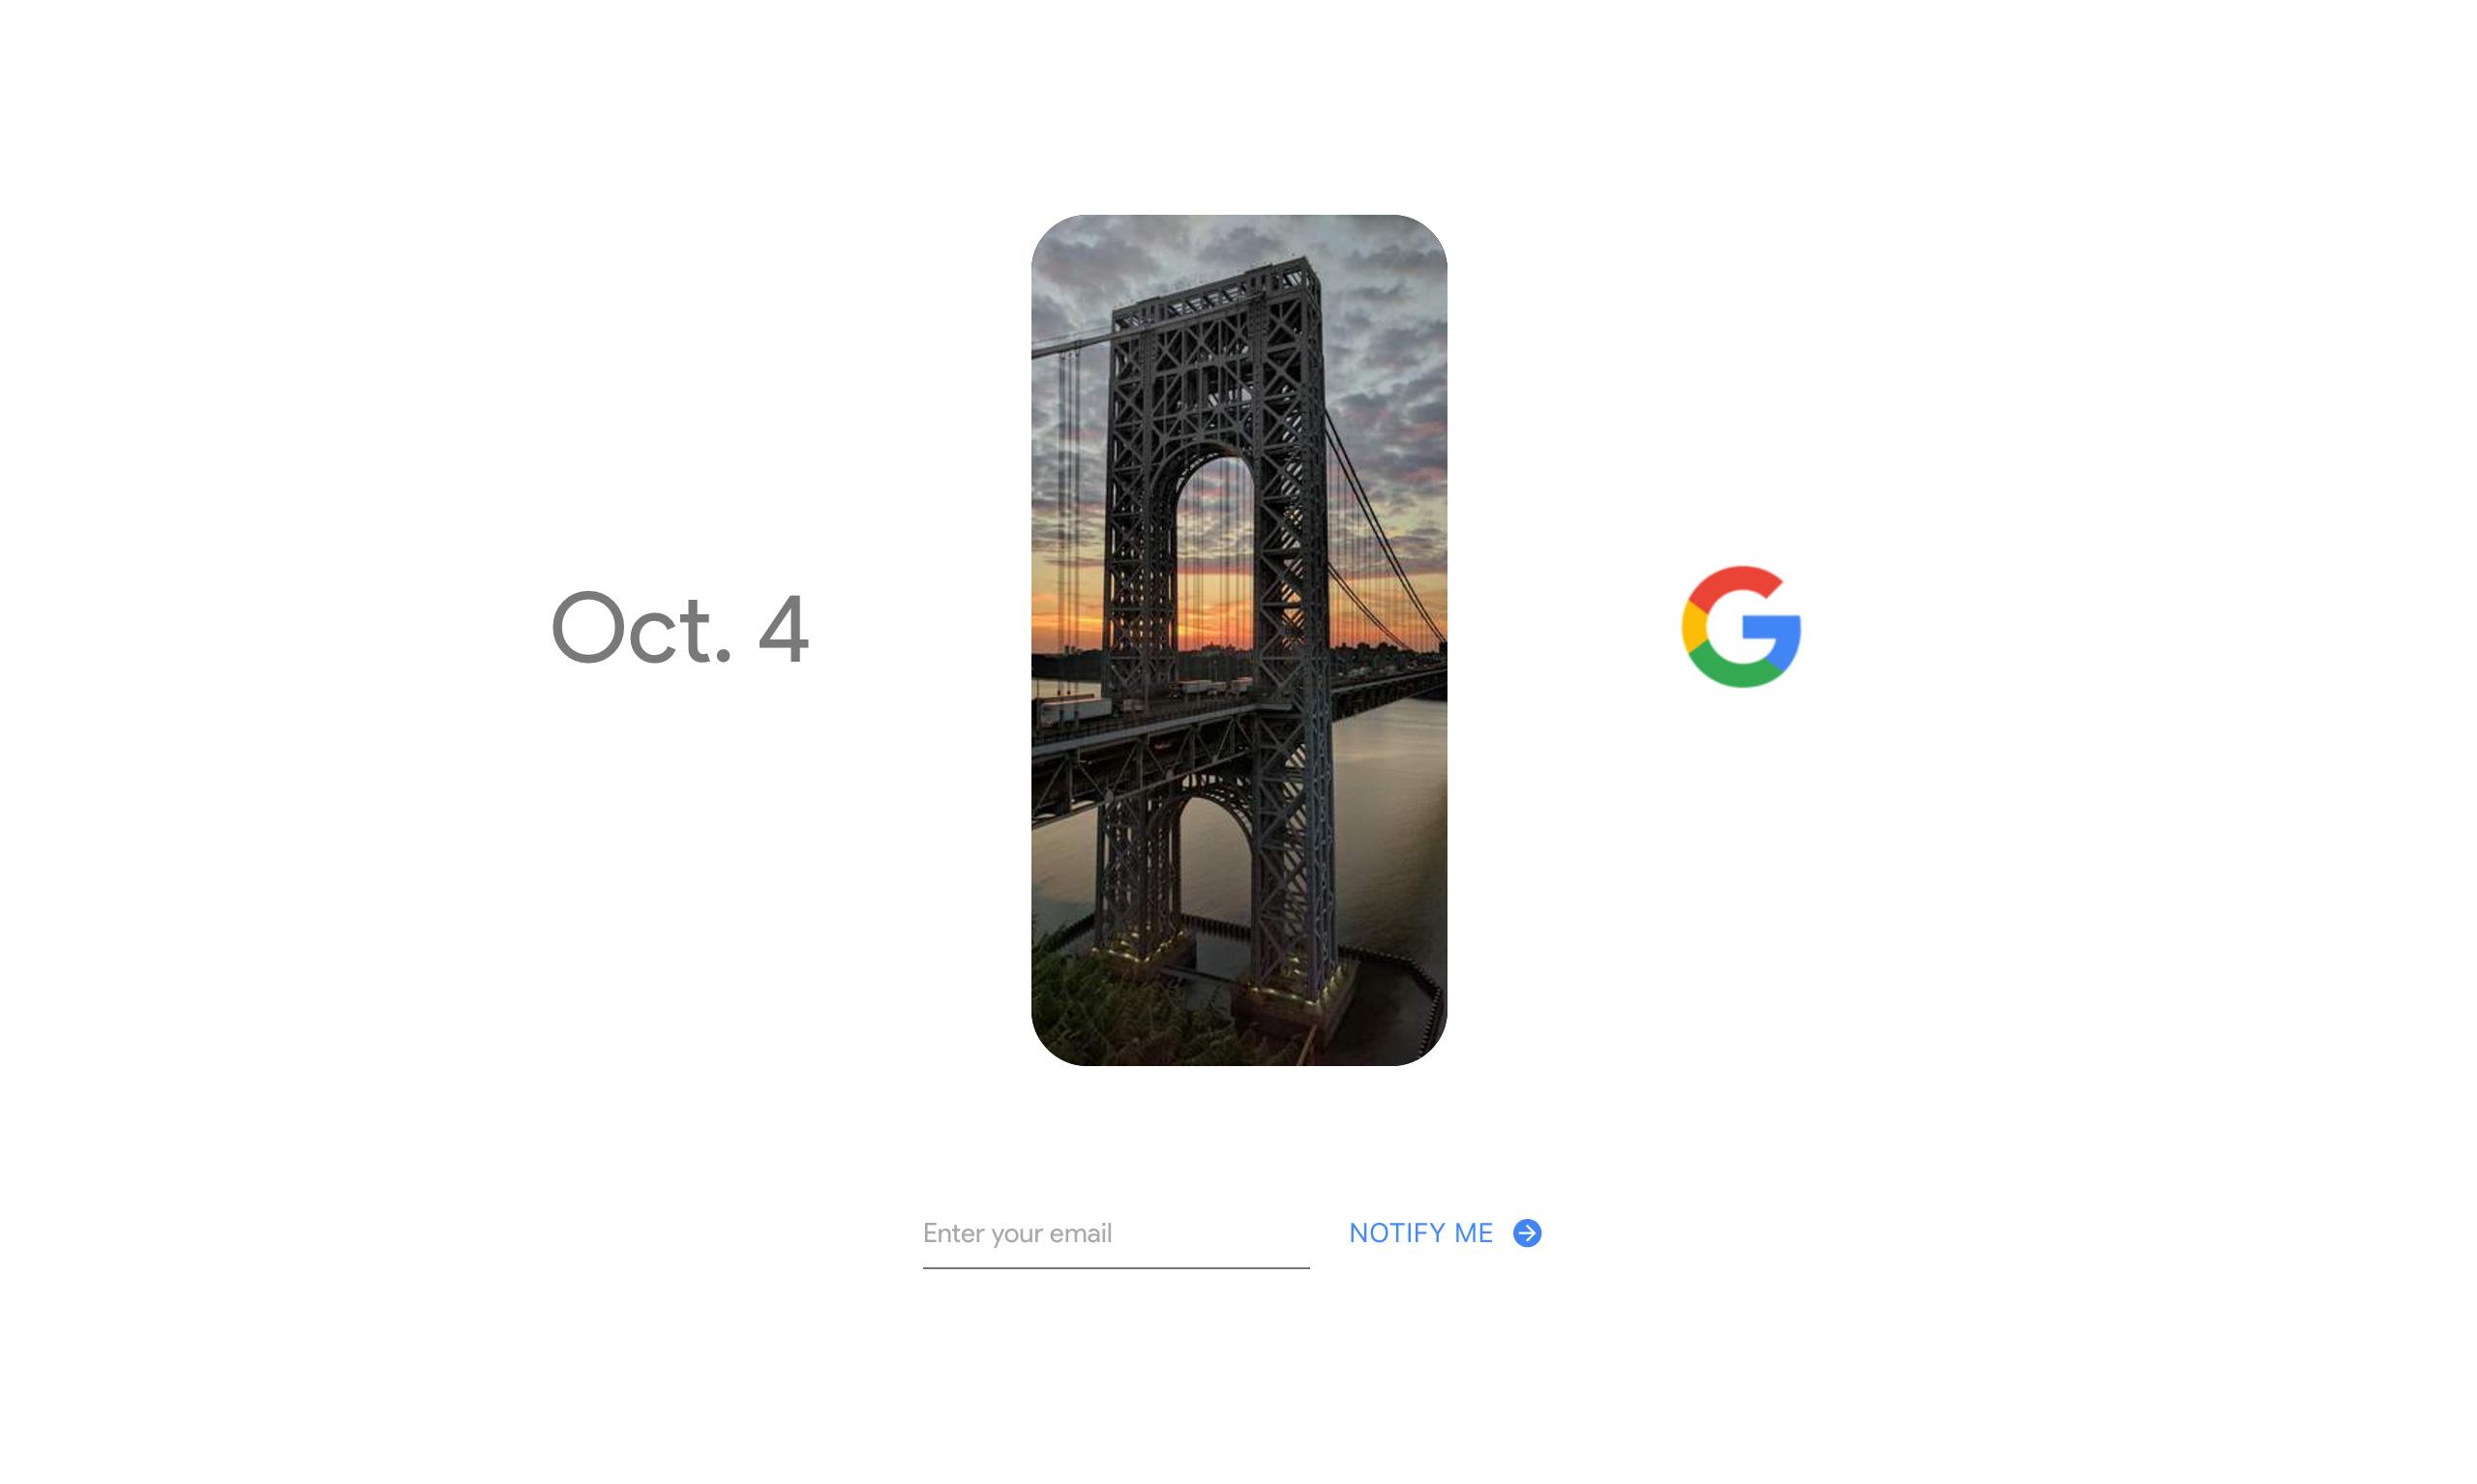 Oct. 4 – Google Big Screenshot